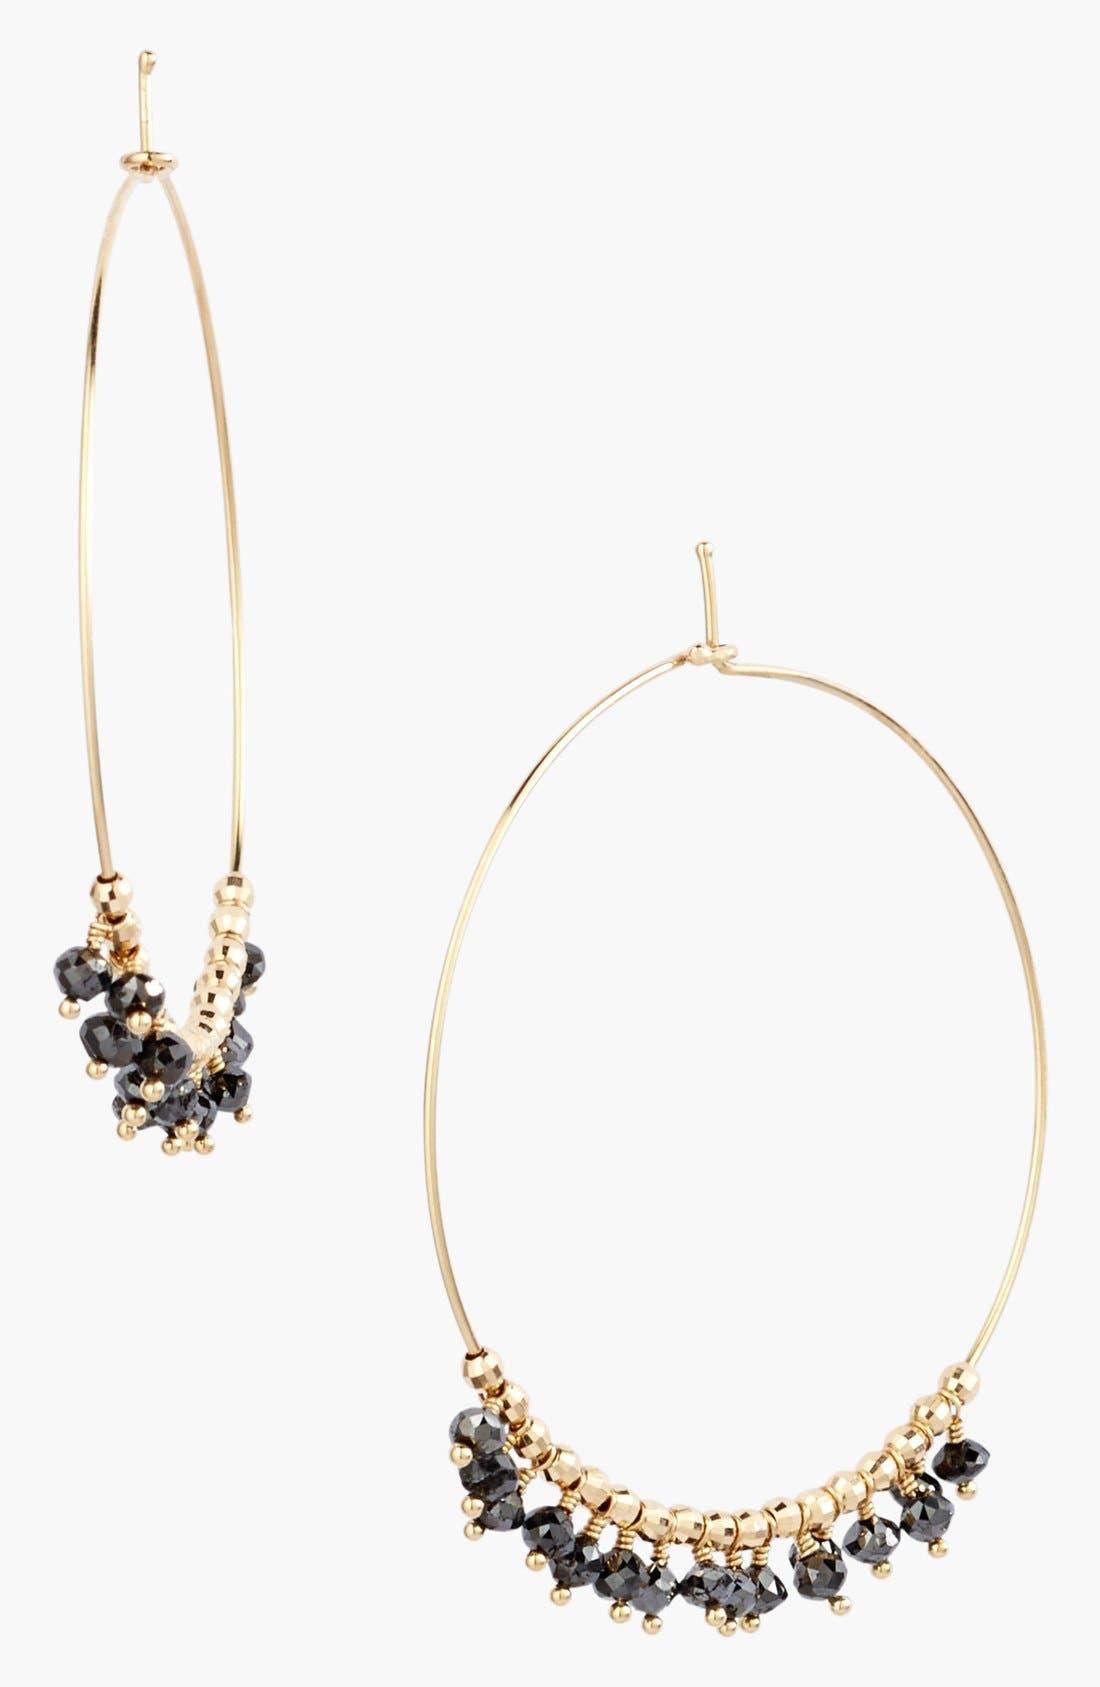 Alternate Image 1 Selected - Mizuki 'Cut Beads' Black Diamond Hoop Earrings